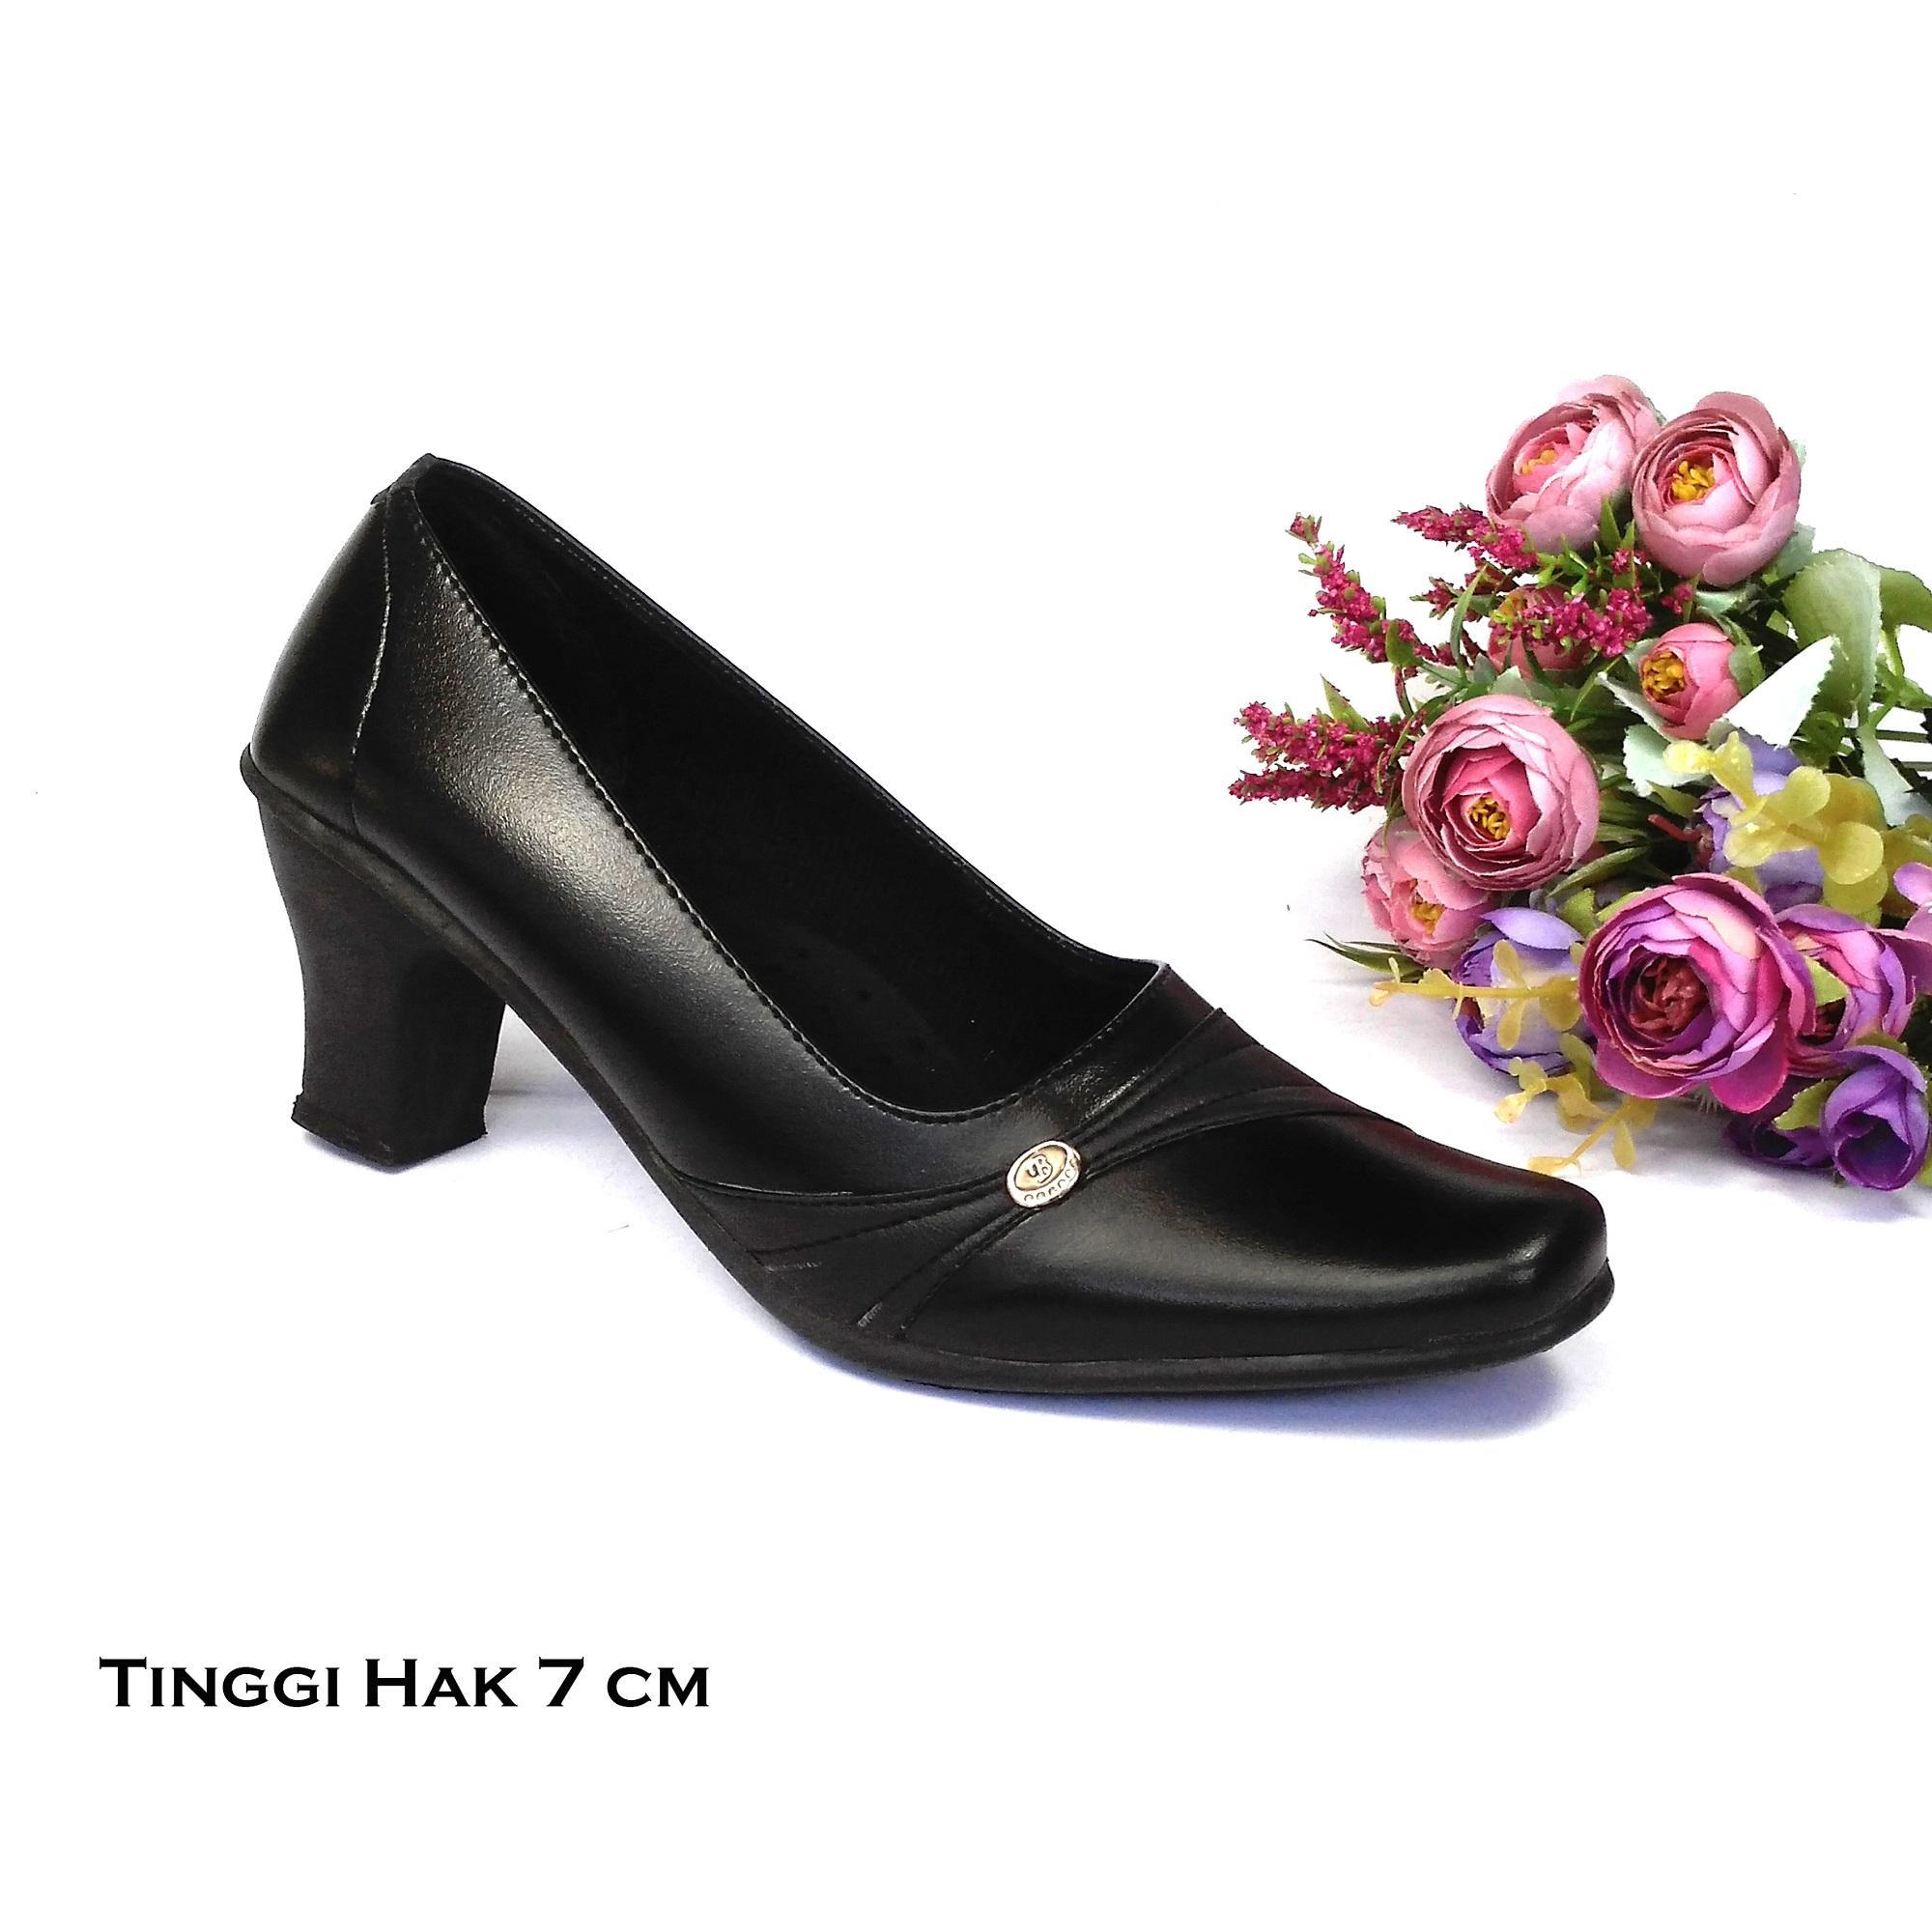 HQo Sepatu Pantofel Wanita   Sepatu Wanita Formal   Sepatu Pantofel  Paskibra Wanita Bertali   Sepatu ... fb12e98cc9